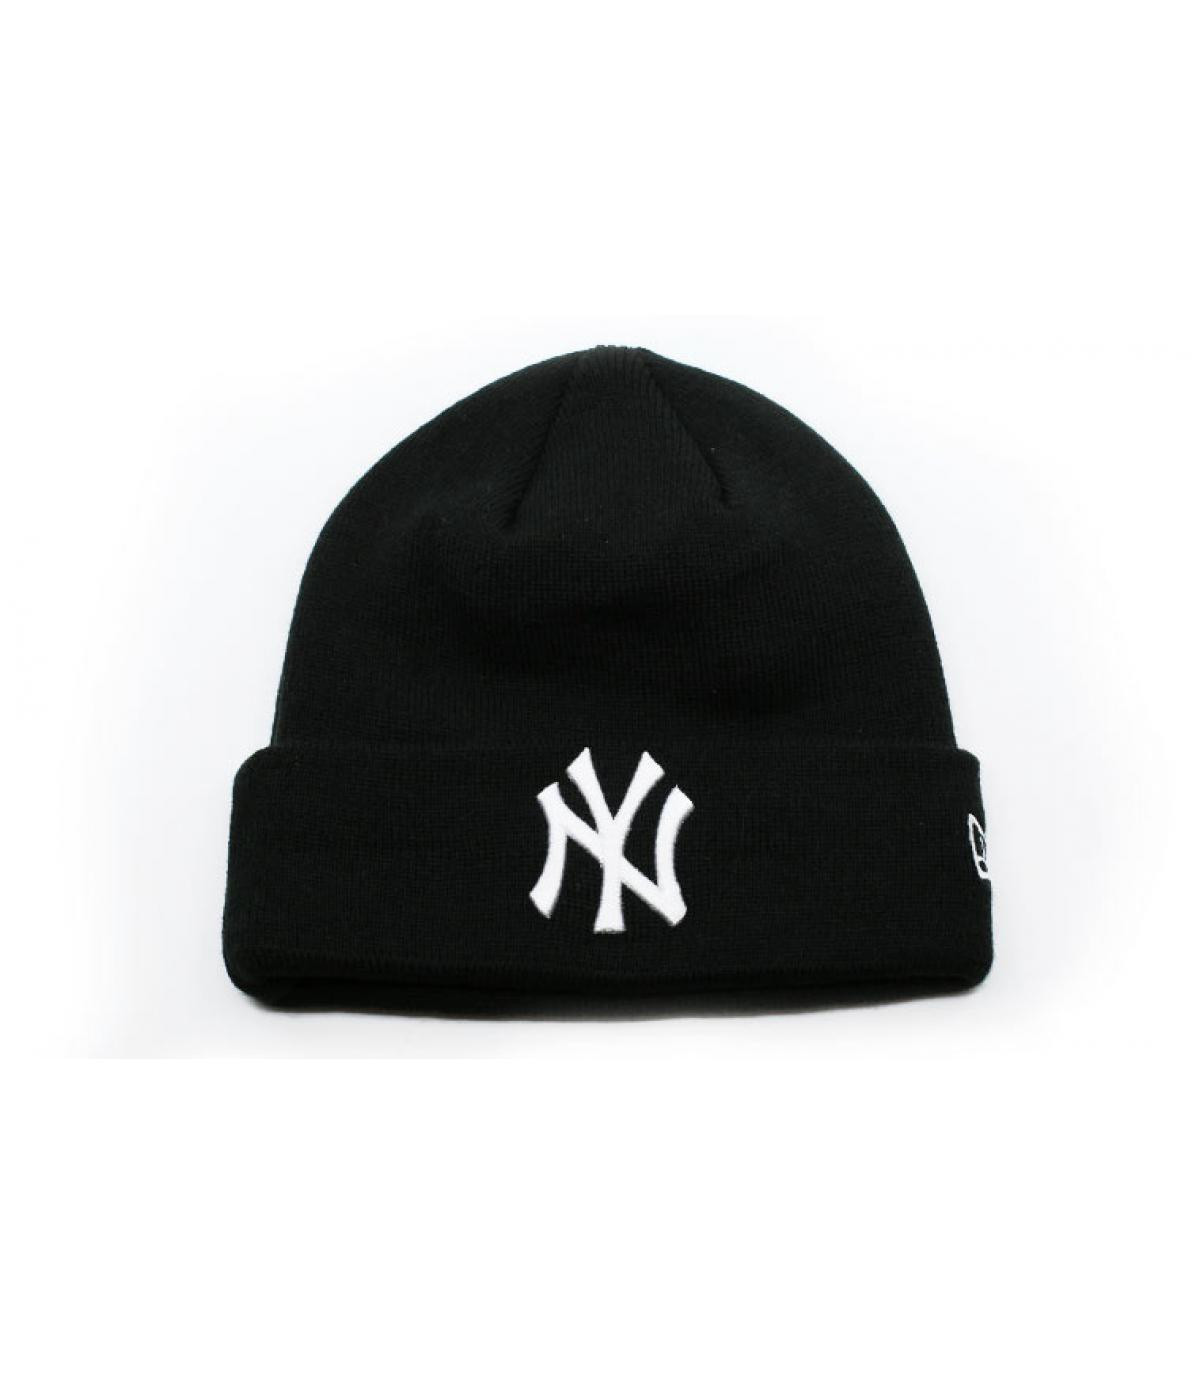 Detalles MLB Essential Cuff NY black white imagen 2